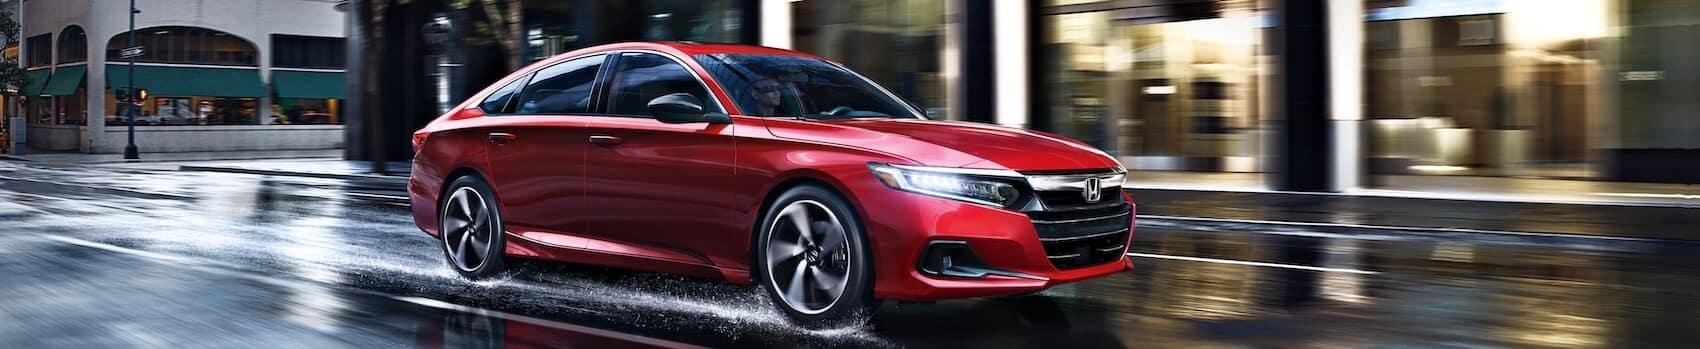 Honda Lease Deals near Cape Coral FL